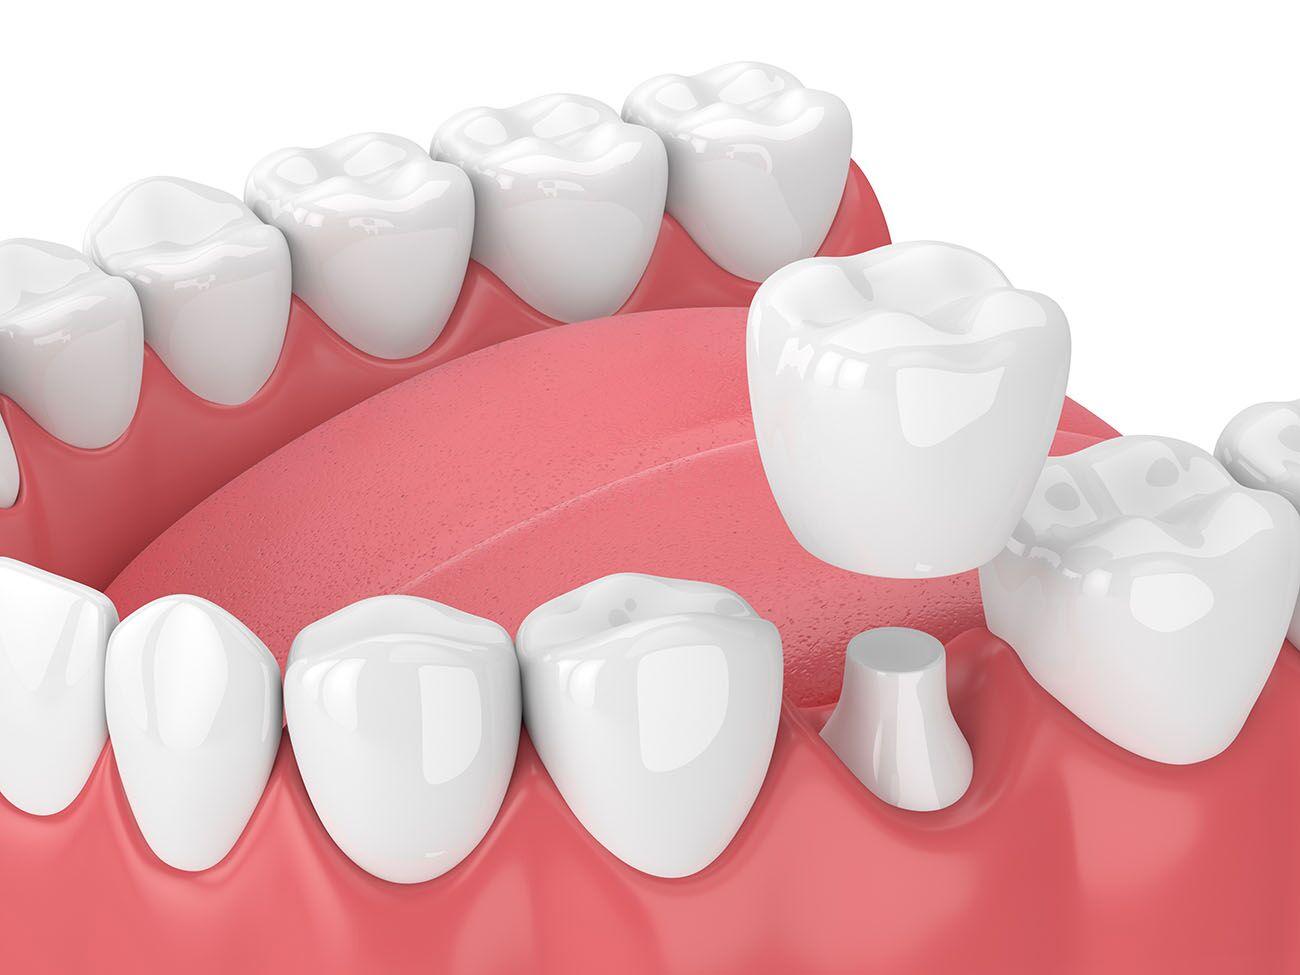 dental crowns in costa mesa, ca